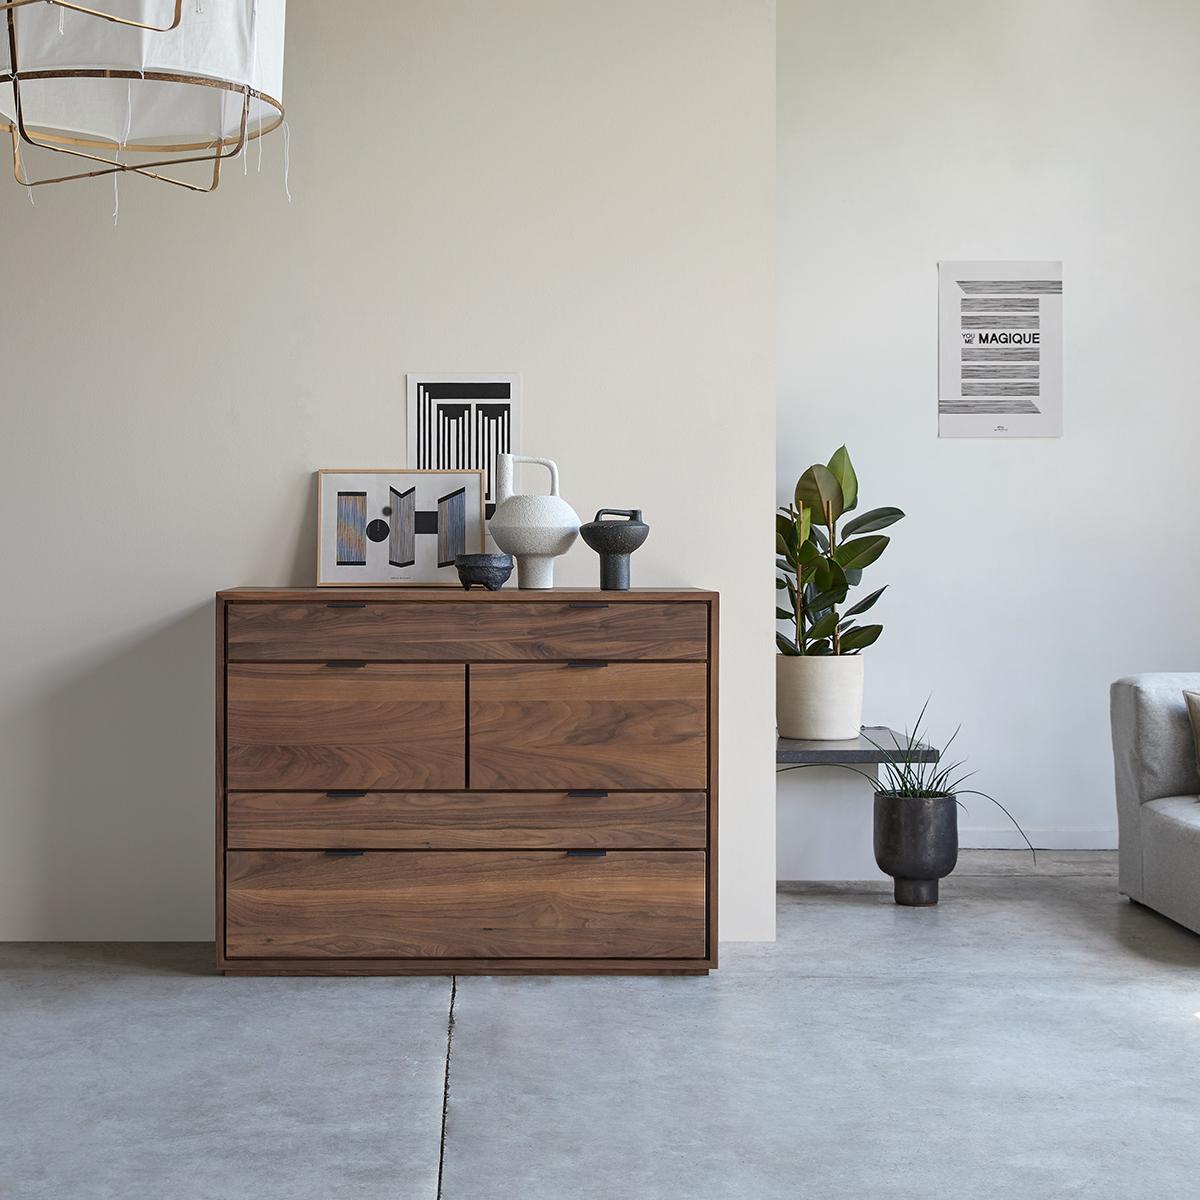 Senson solid walnut chest of drawers